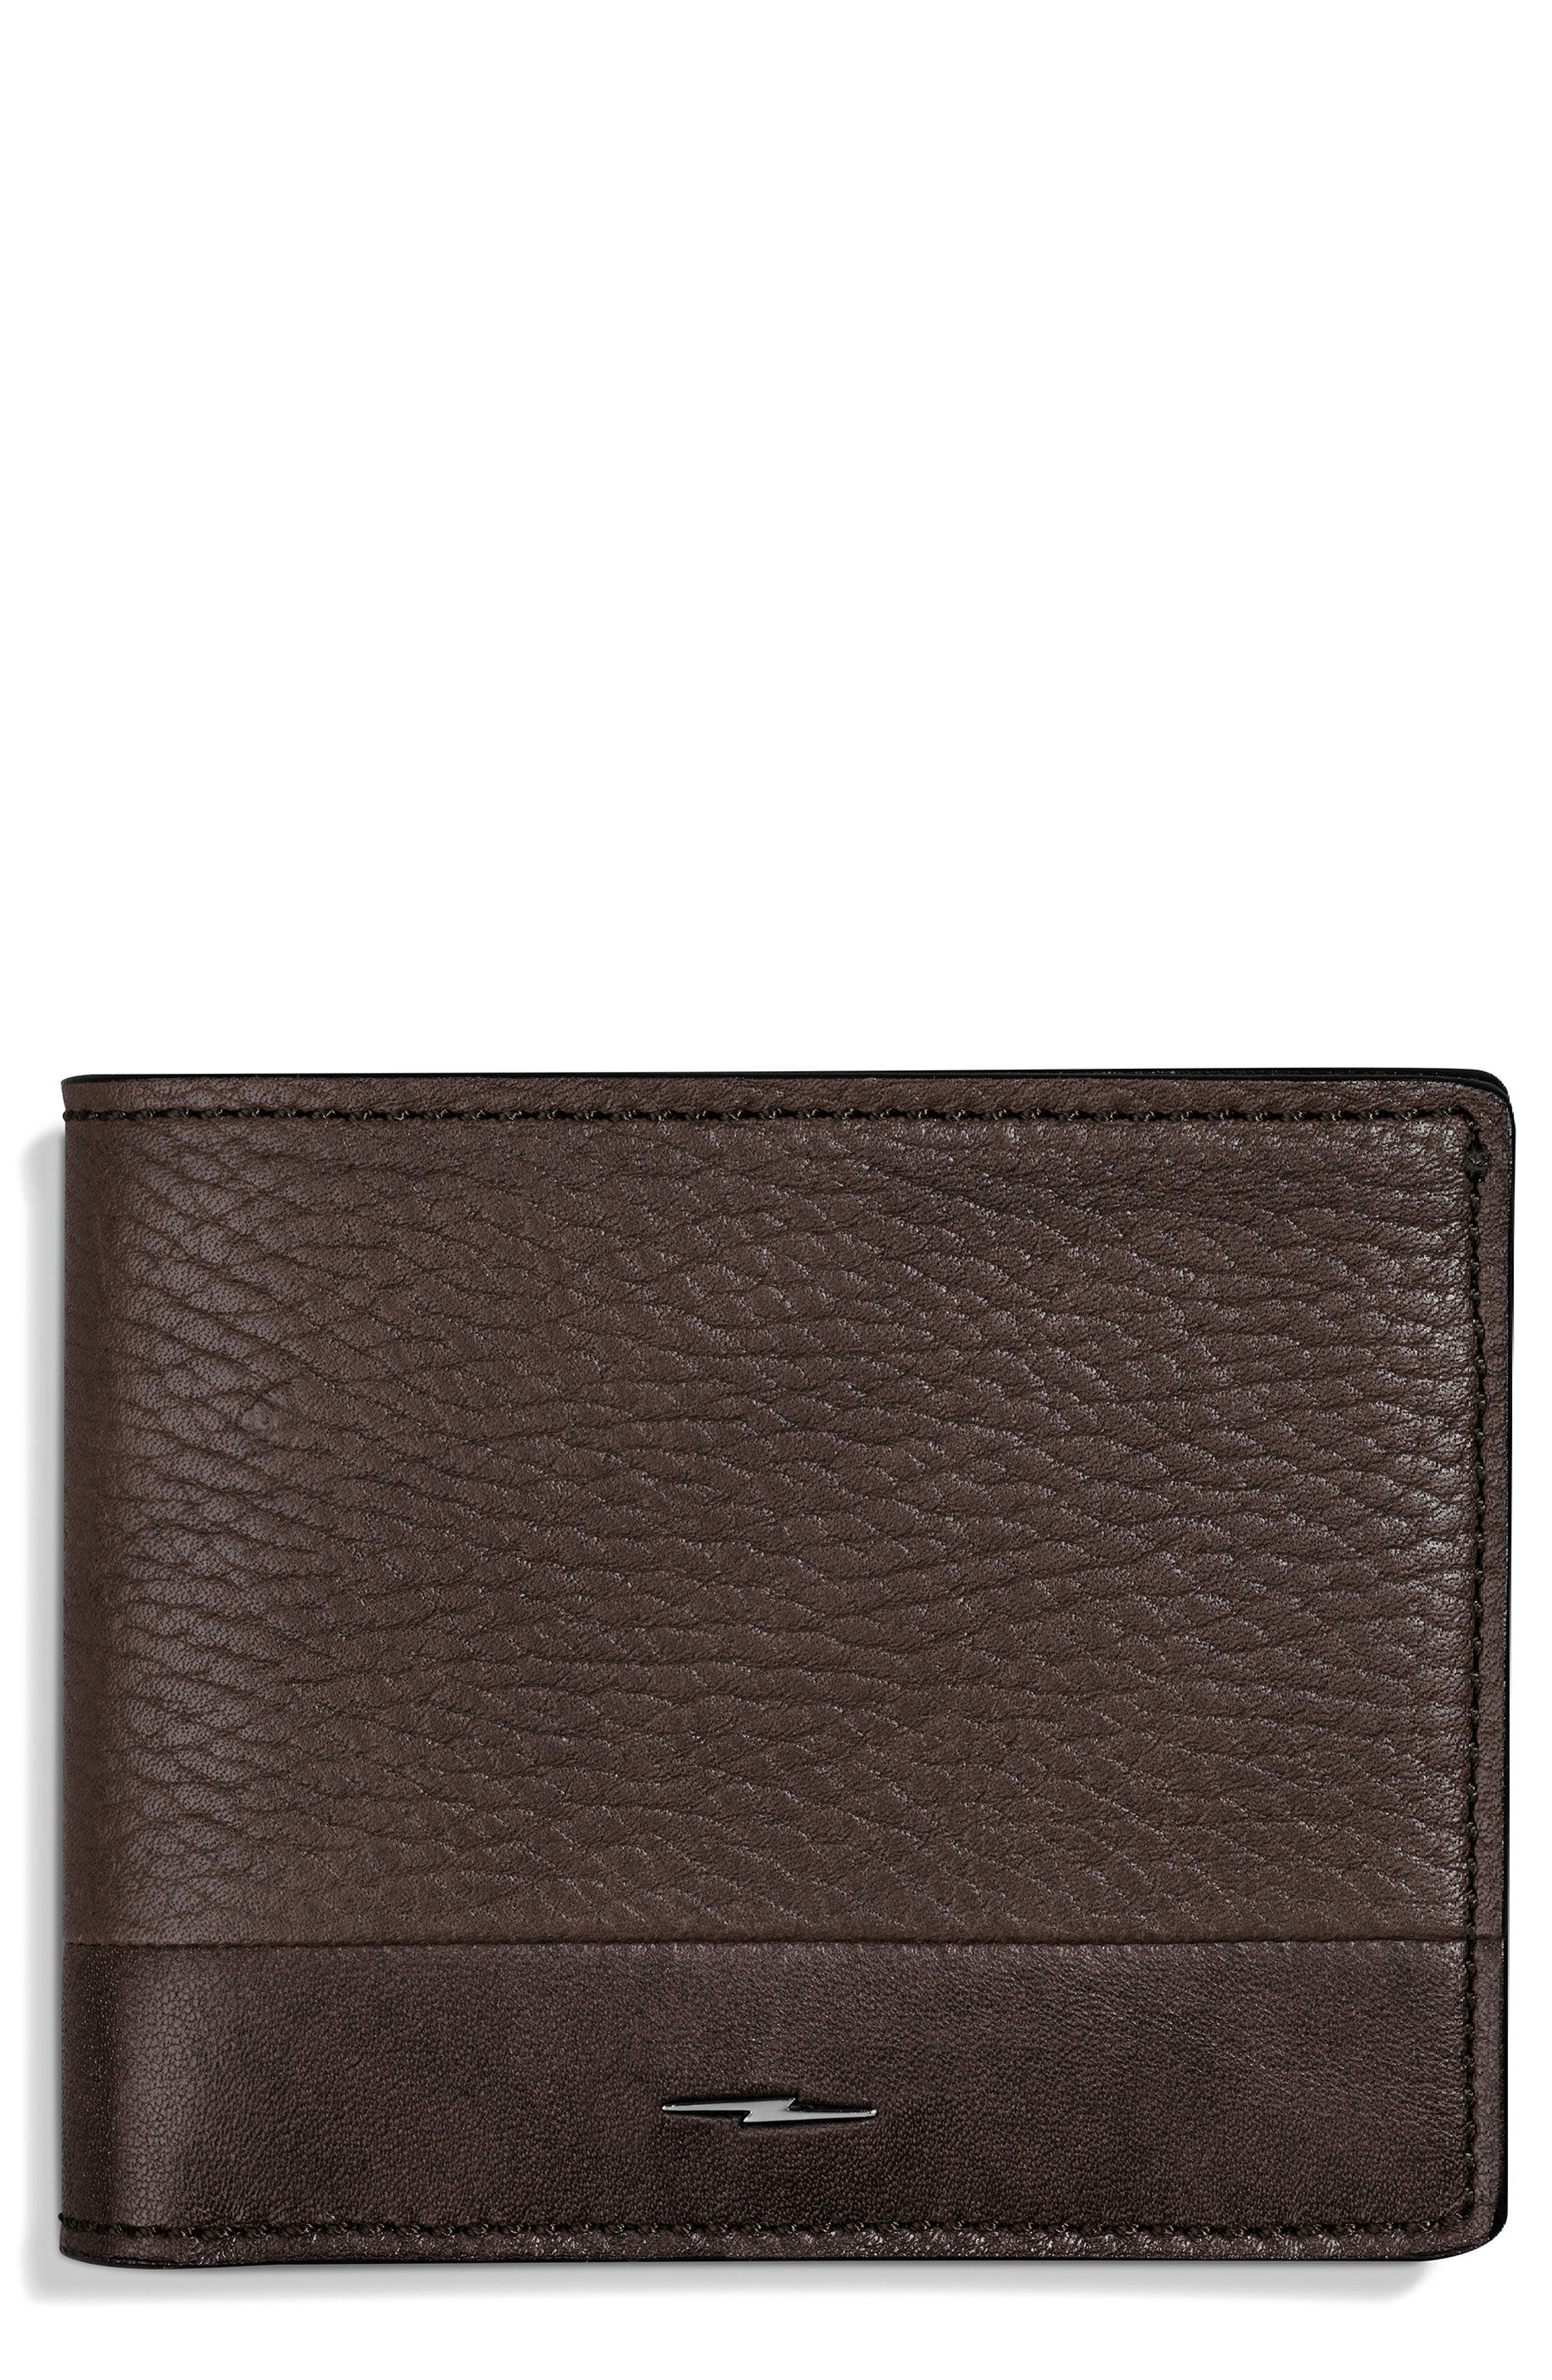 Bolt Leather Wallet,                         Main,                         color, 240